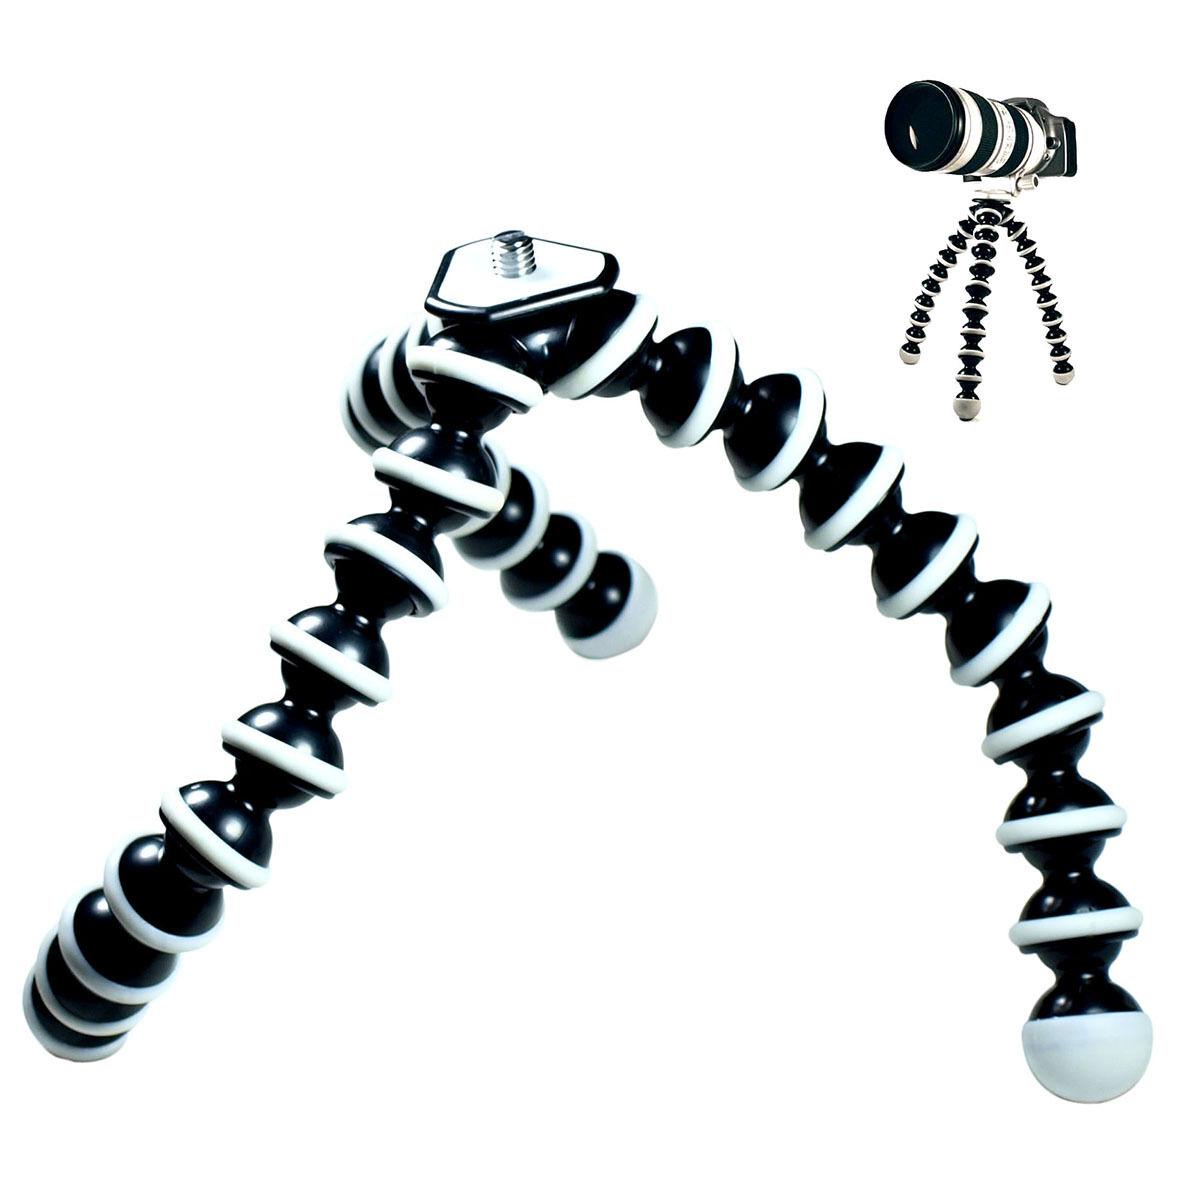 Large Flexible Tripod Stand Gorillapod for Camera Digital DV Canon Nikon -  T2eC16J   cE9s4PsMmnBSDmDeWS g  60 57 - Large Flexible Tripod Stand Gorillapod for Camera Digital DV Canon Nikon